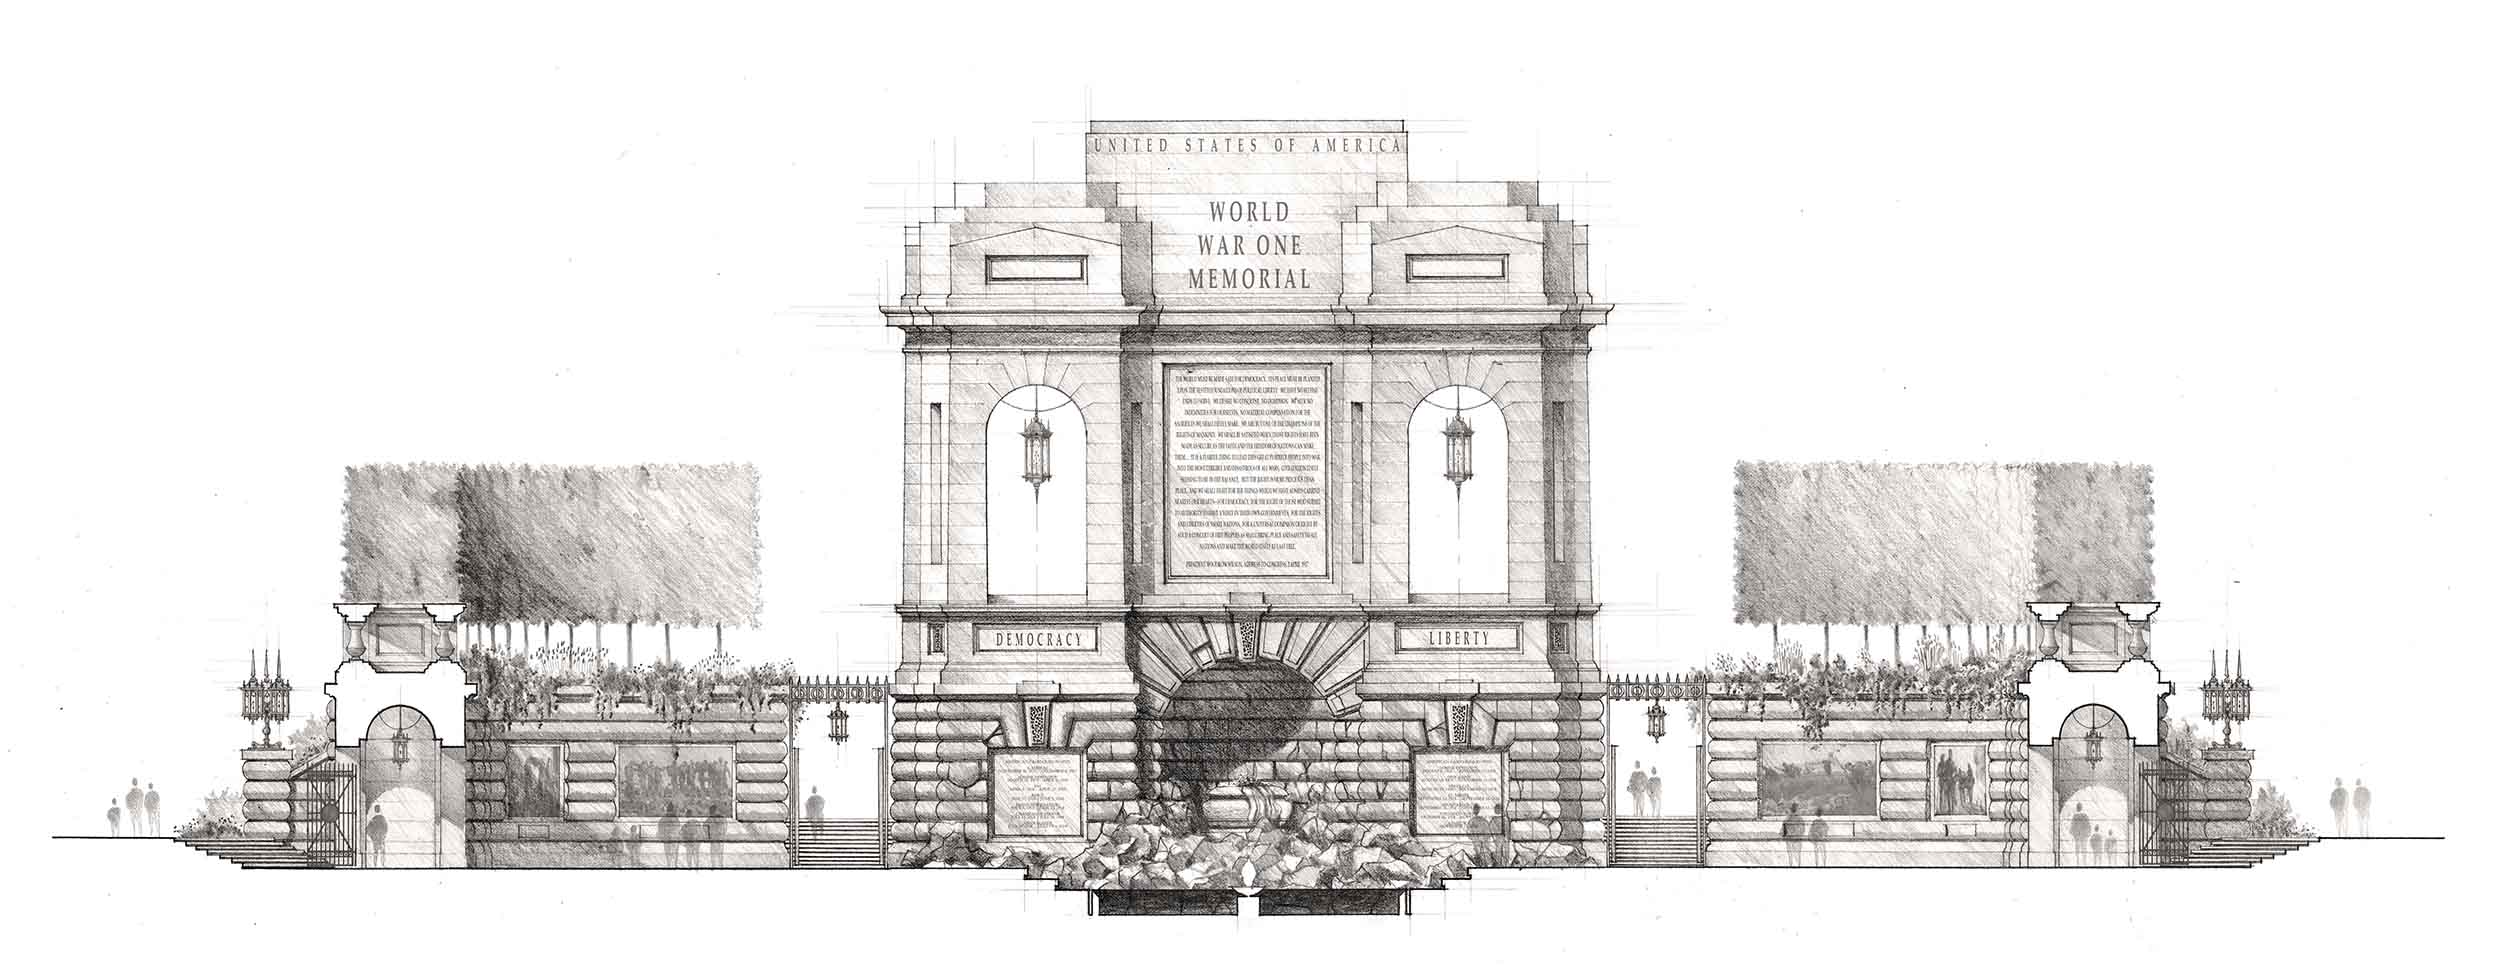 War-Memorial-Classical-Style-Architect.jpg